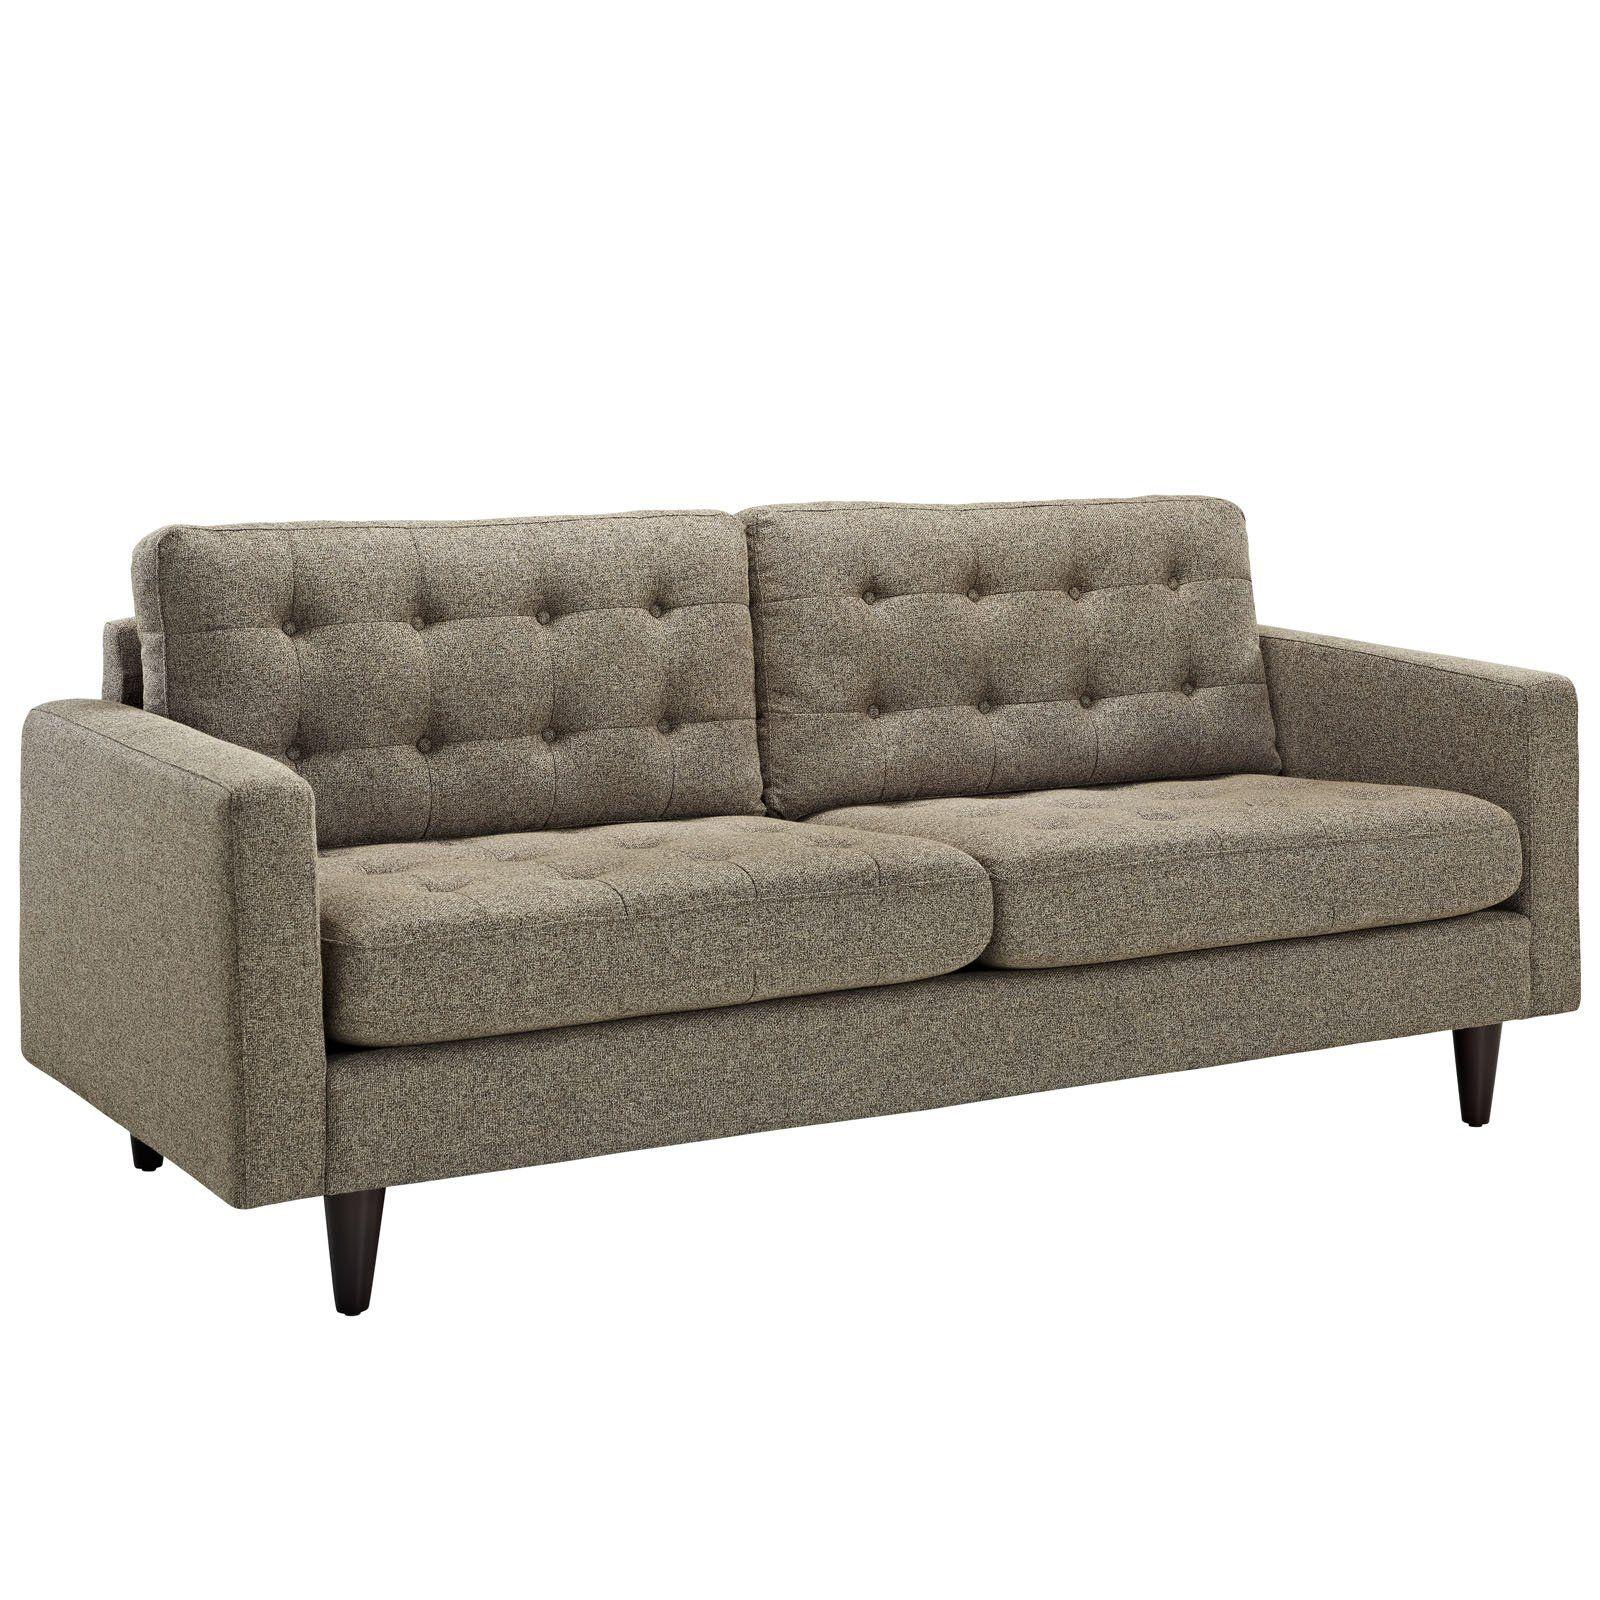 Amazon Com Lexmod Empress Upholstered Sofa Azure Granite